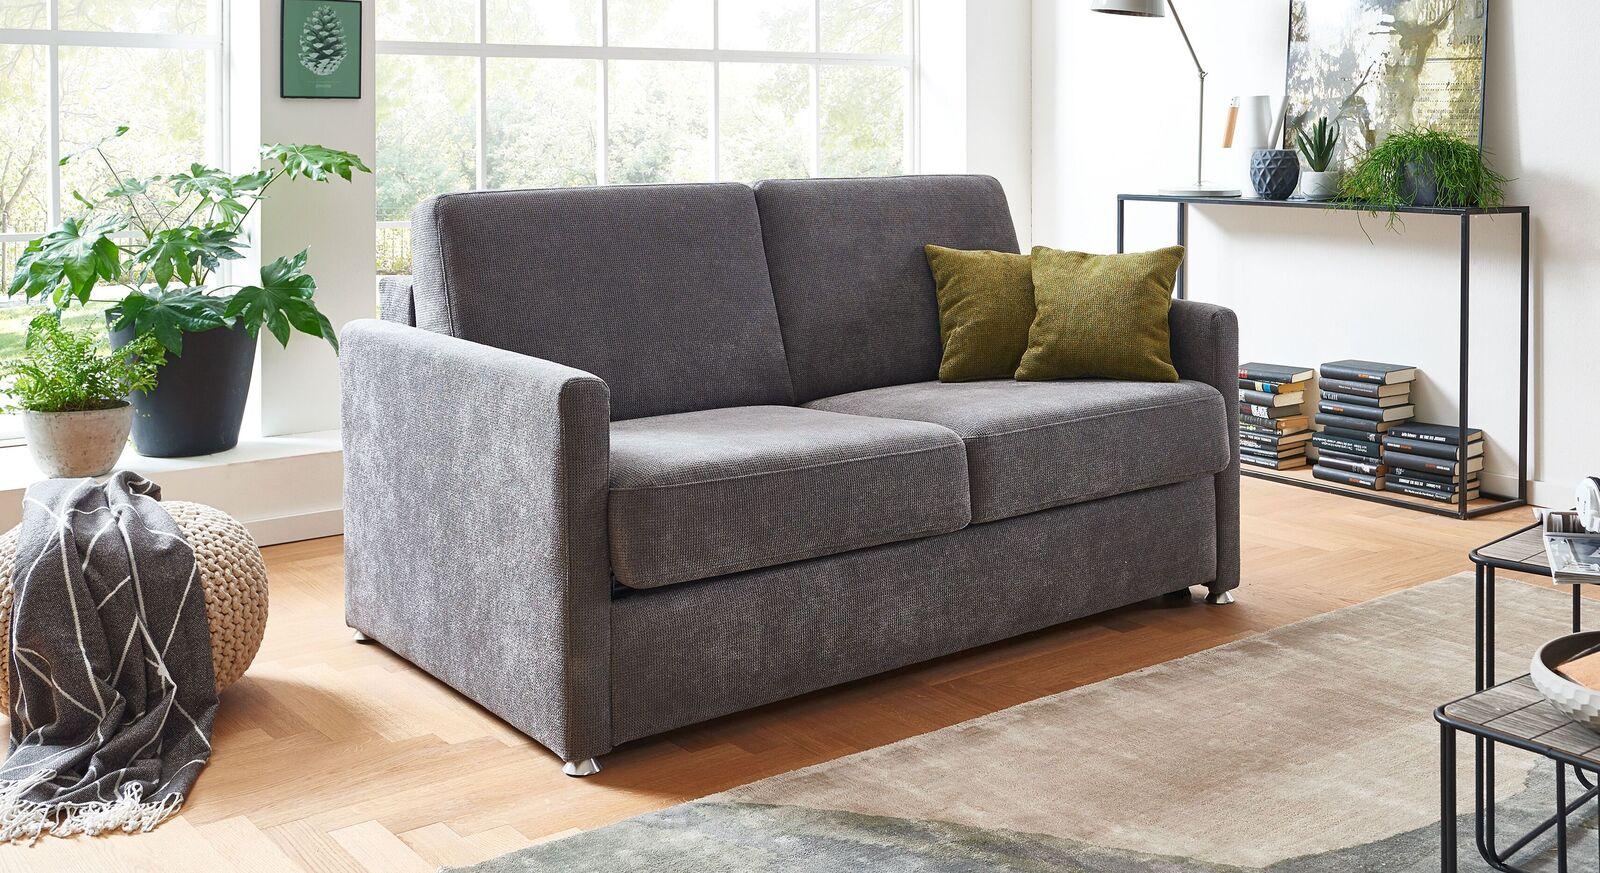 Schlafsofa Tullia mit gepolsterter Sitzfläche